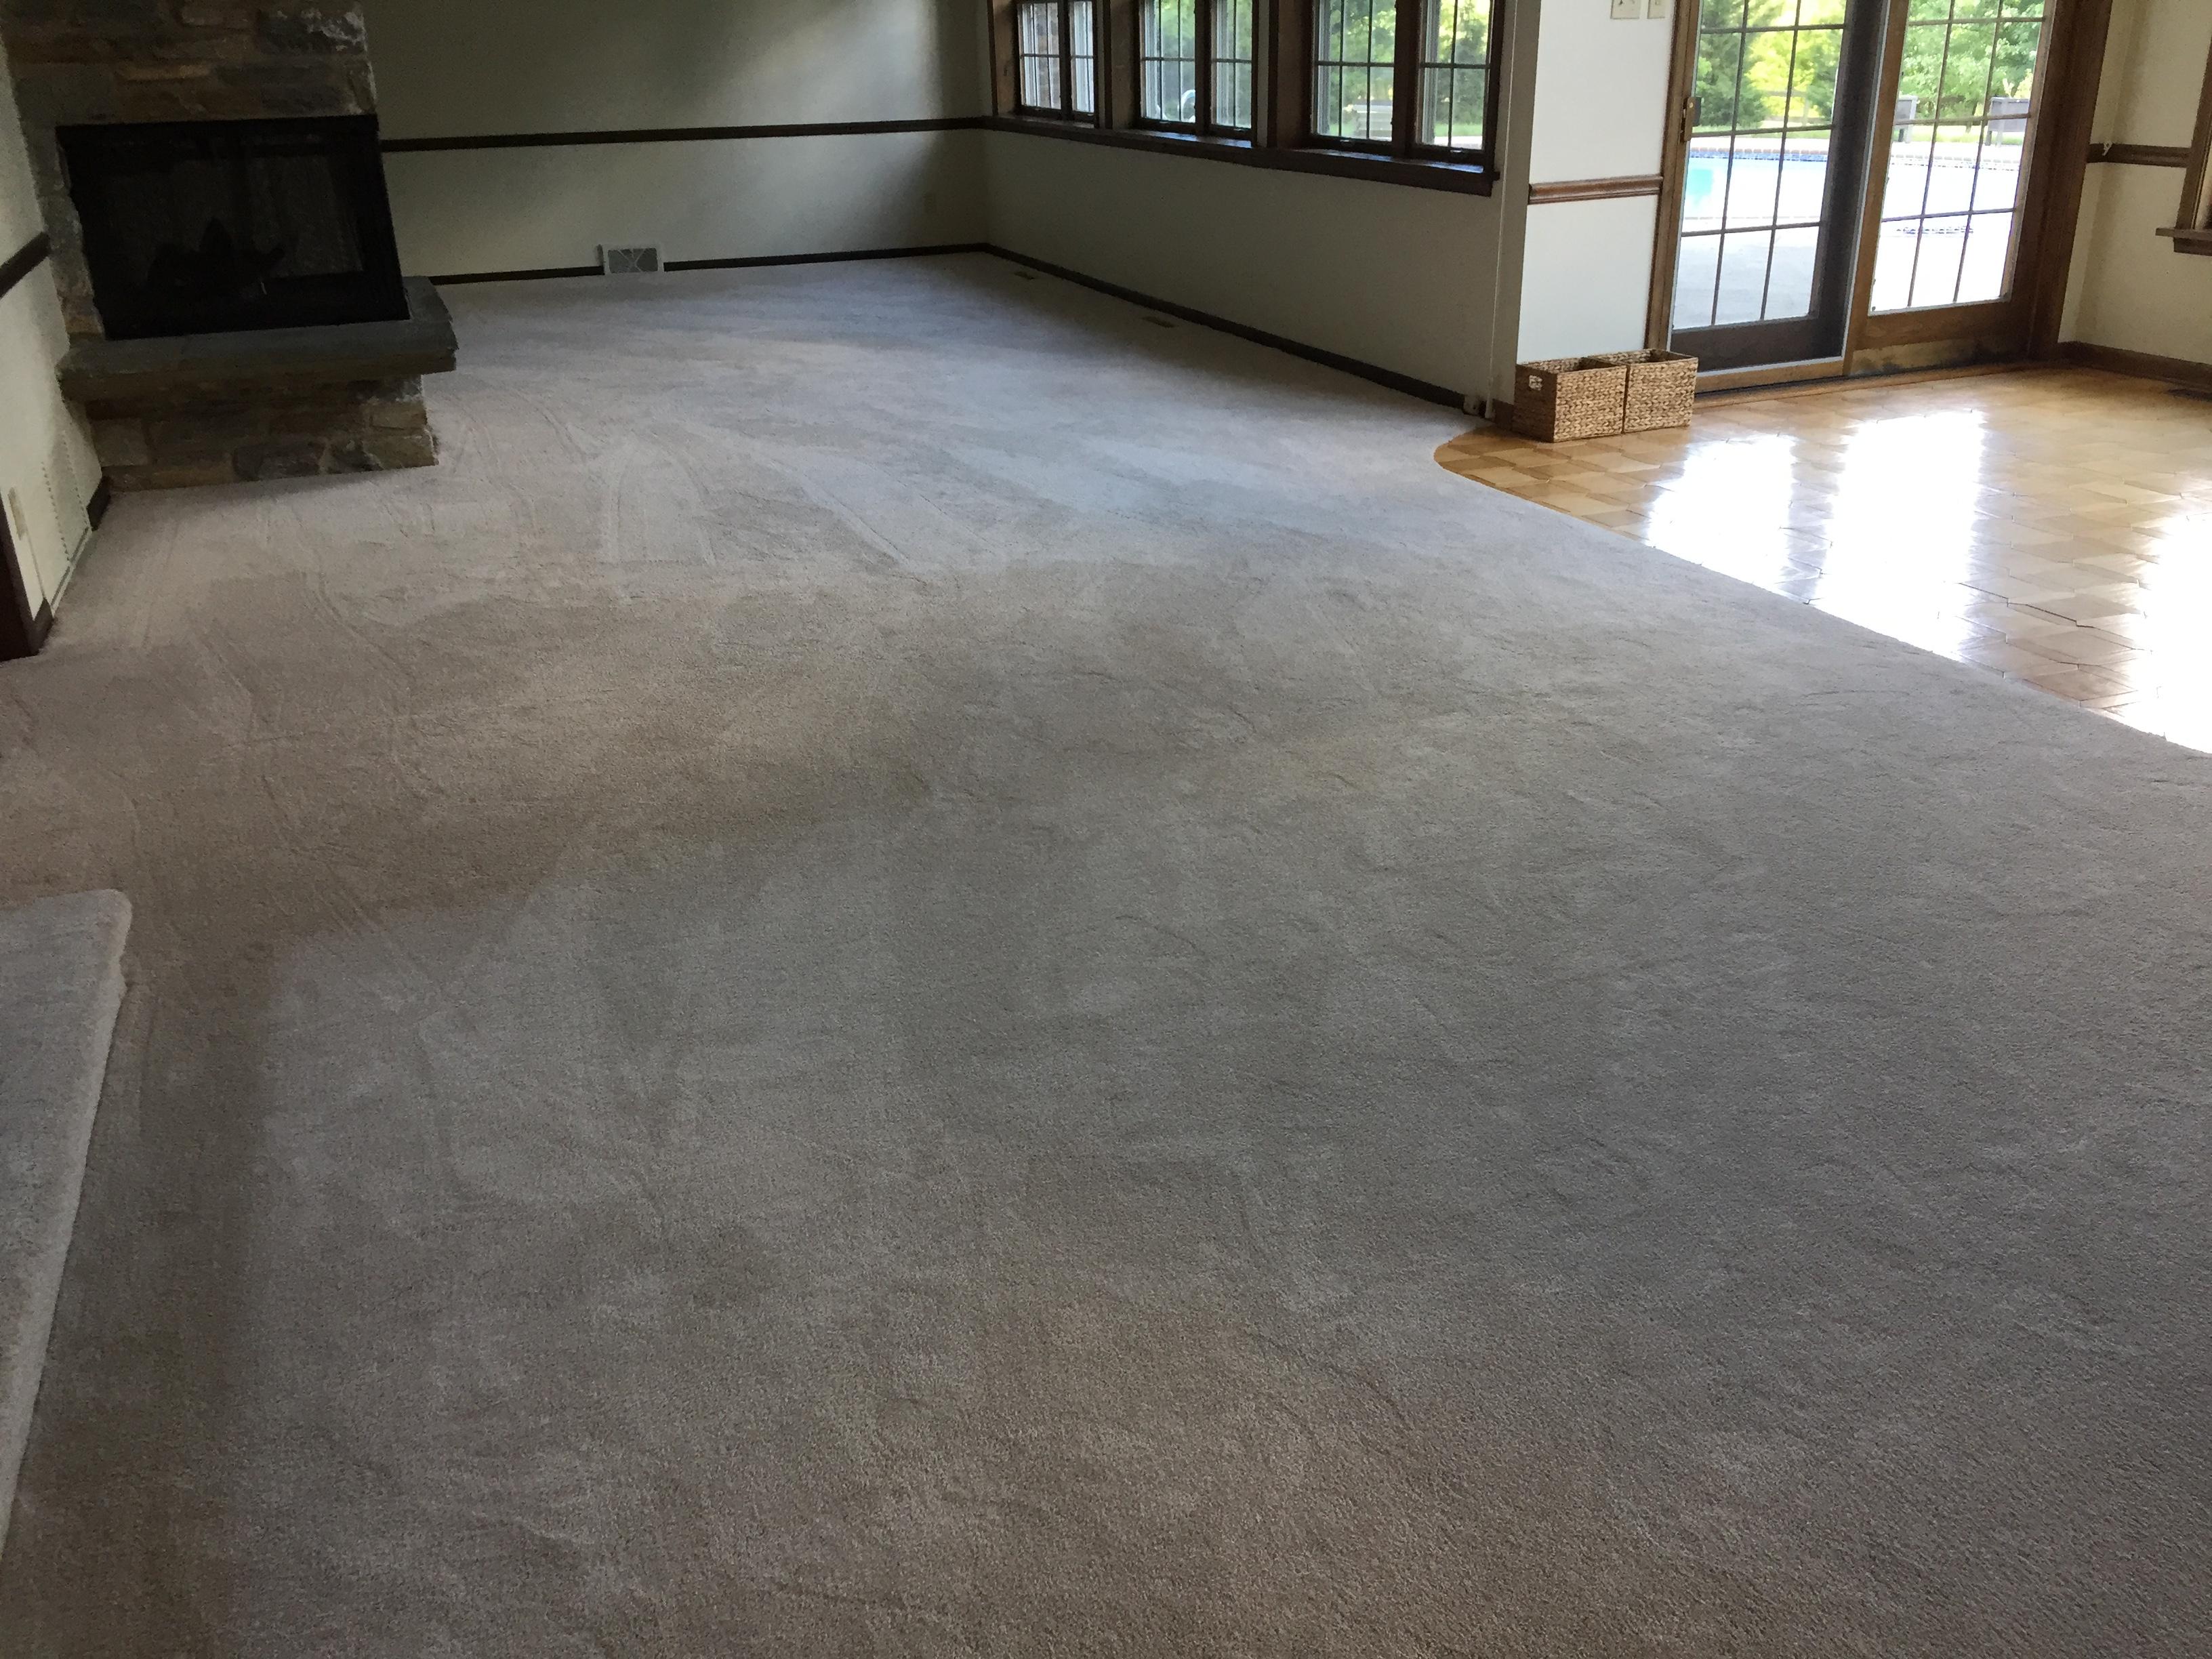 Carpet Installation Montco